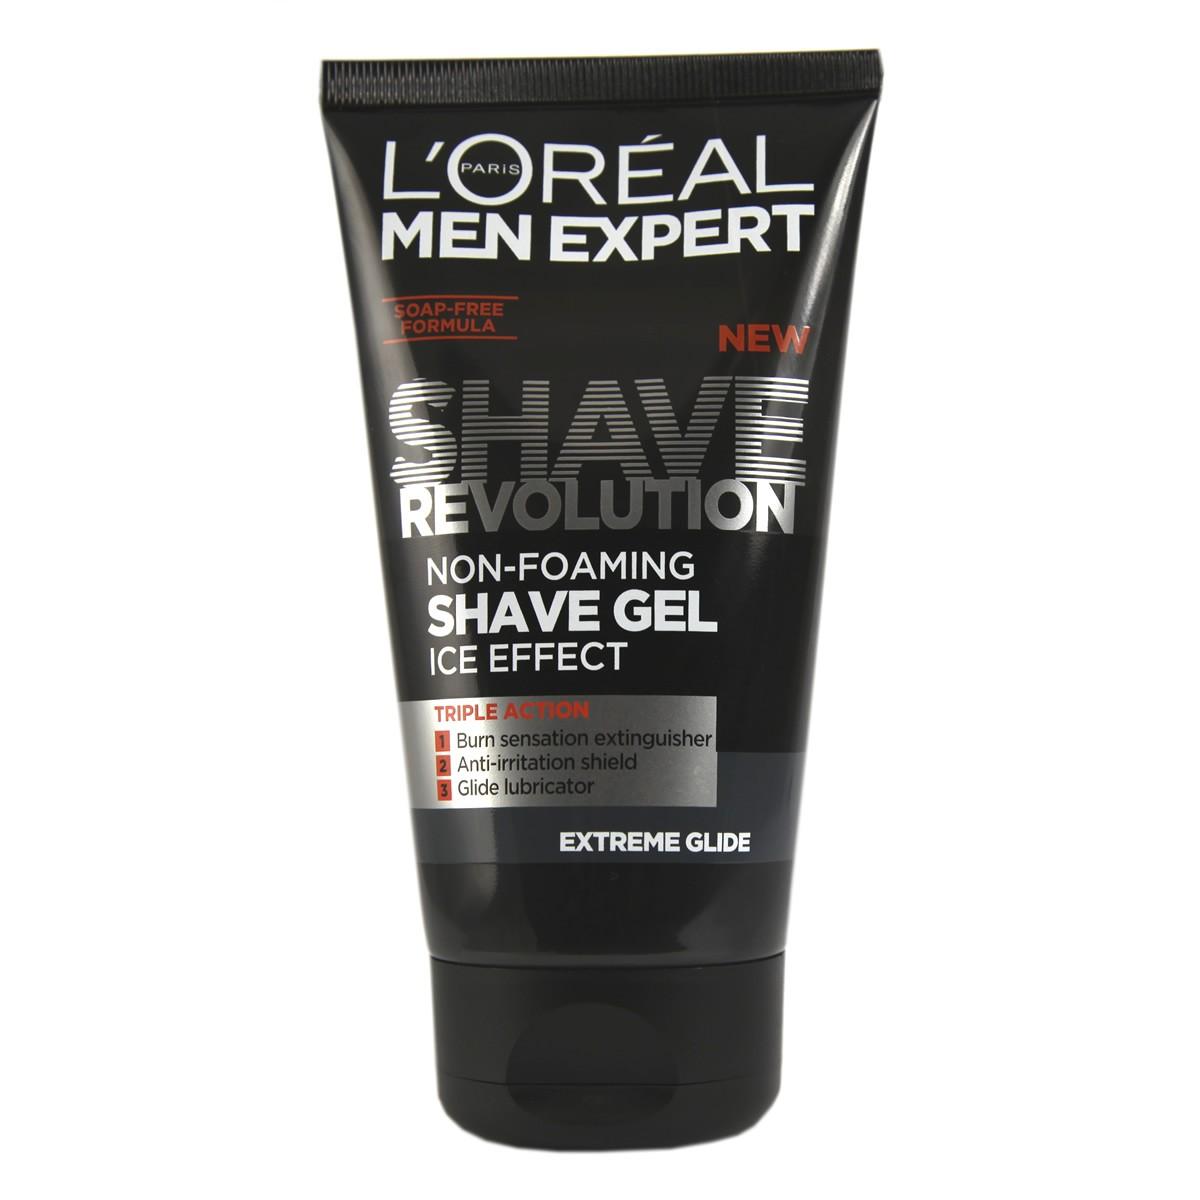 L'Oreal Paris Men Expert Shave Revolution Extreme Glide Non-Foaming Shave Gel